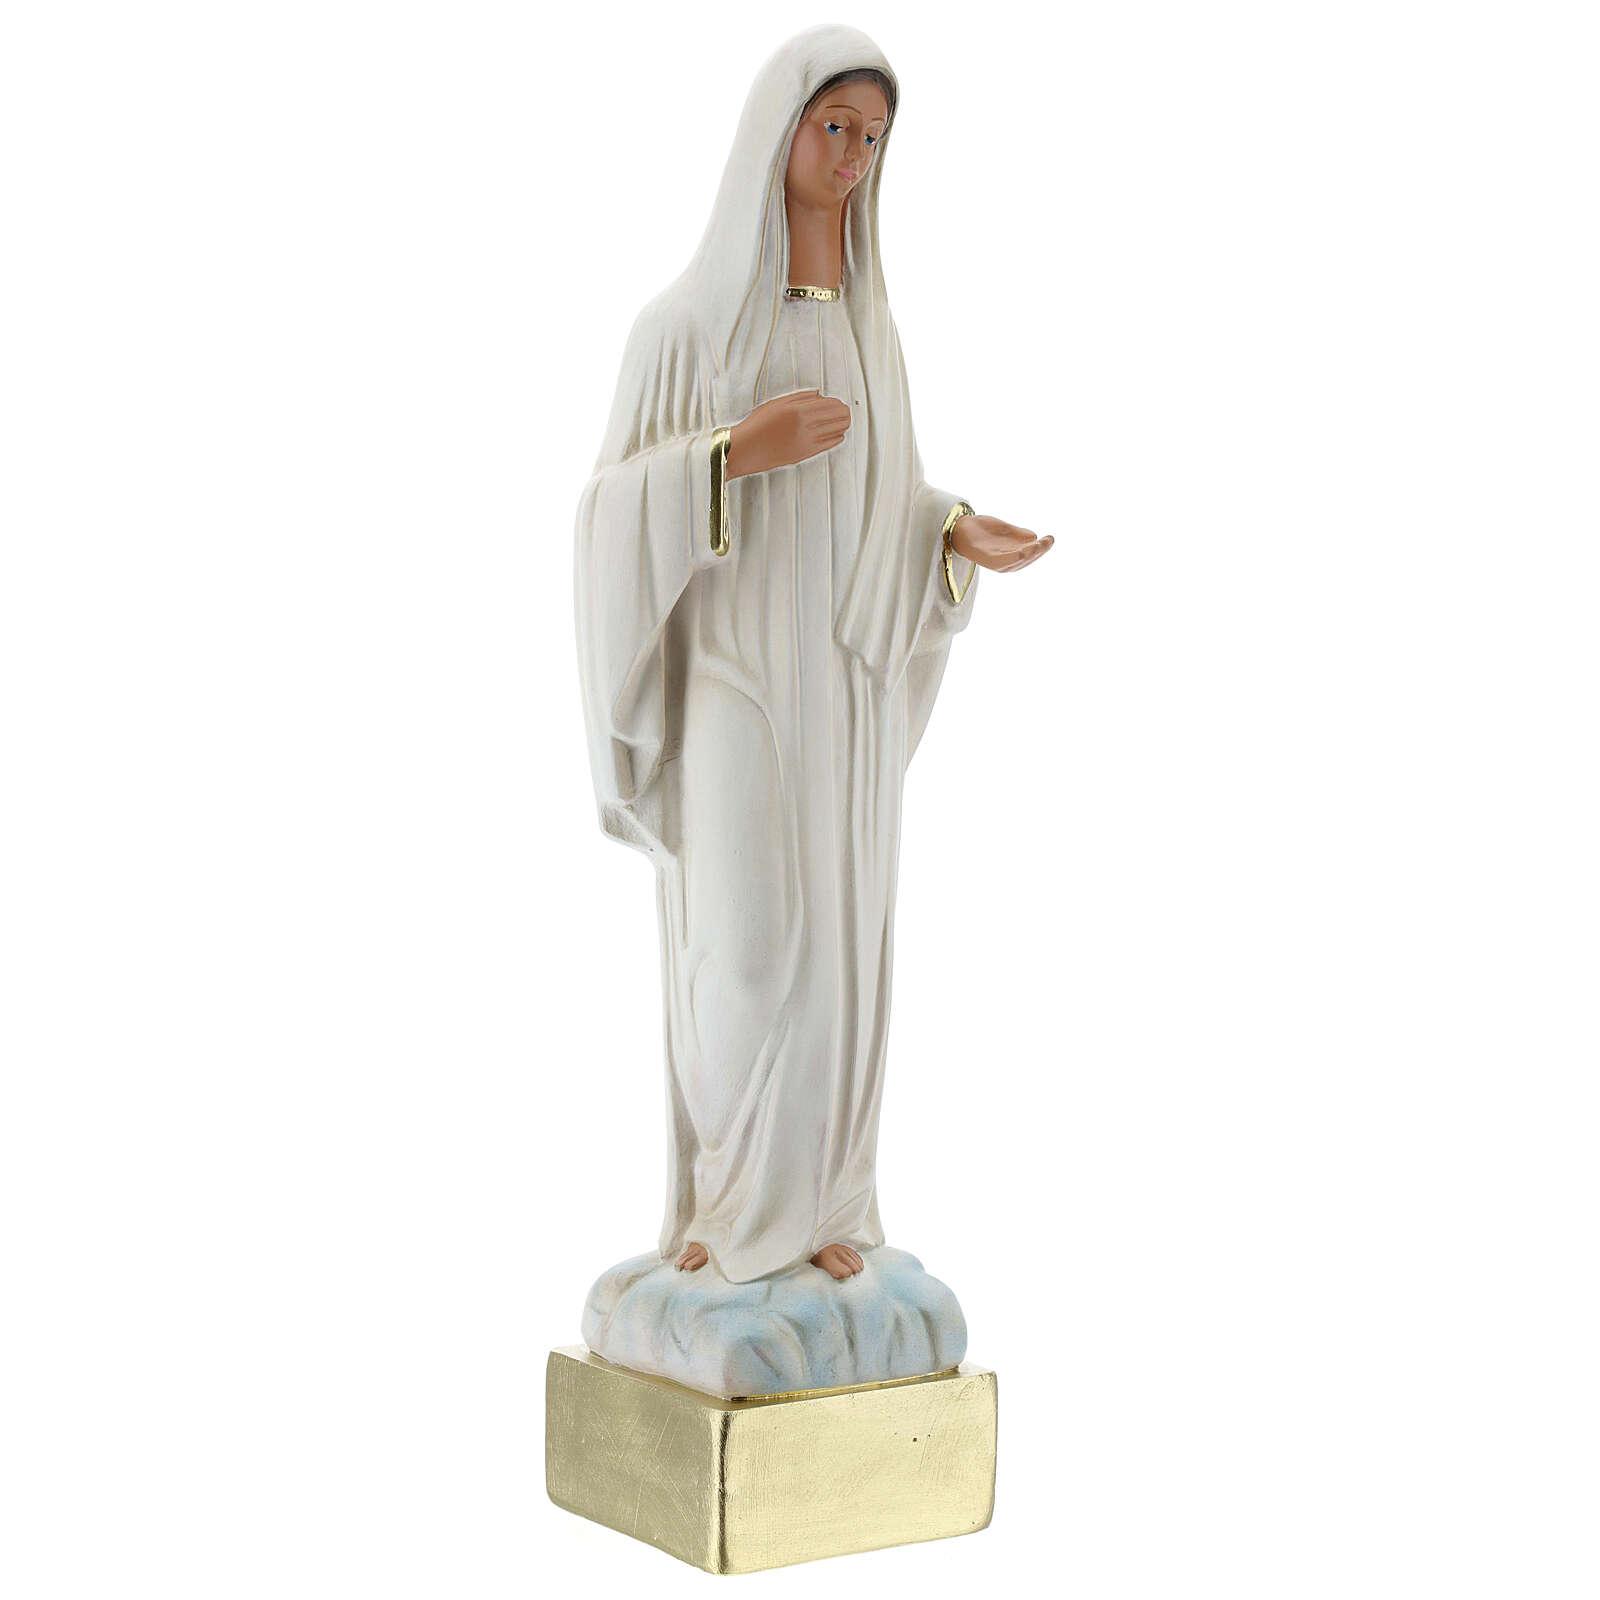 Madonna Medjugorje 37 cm statua gesso dipinta a mano Barsanti 4